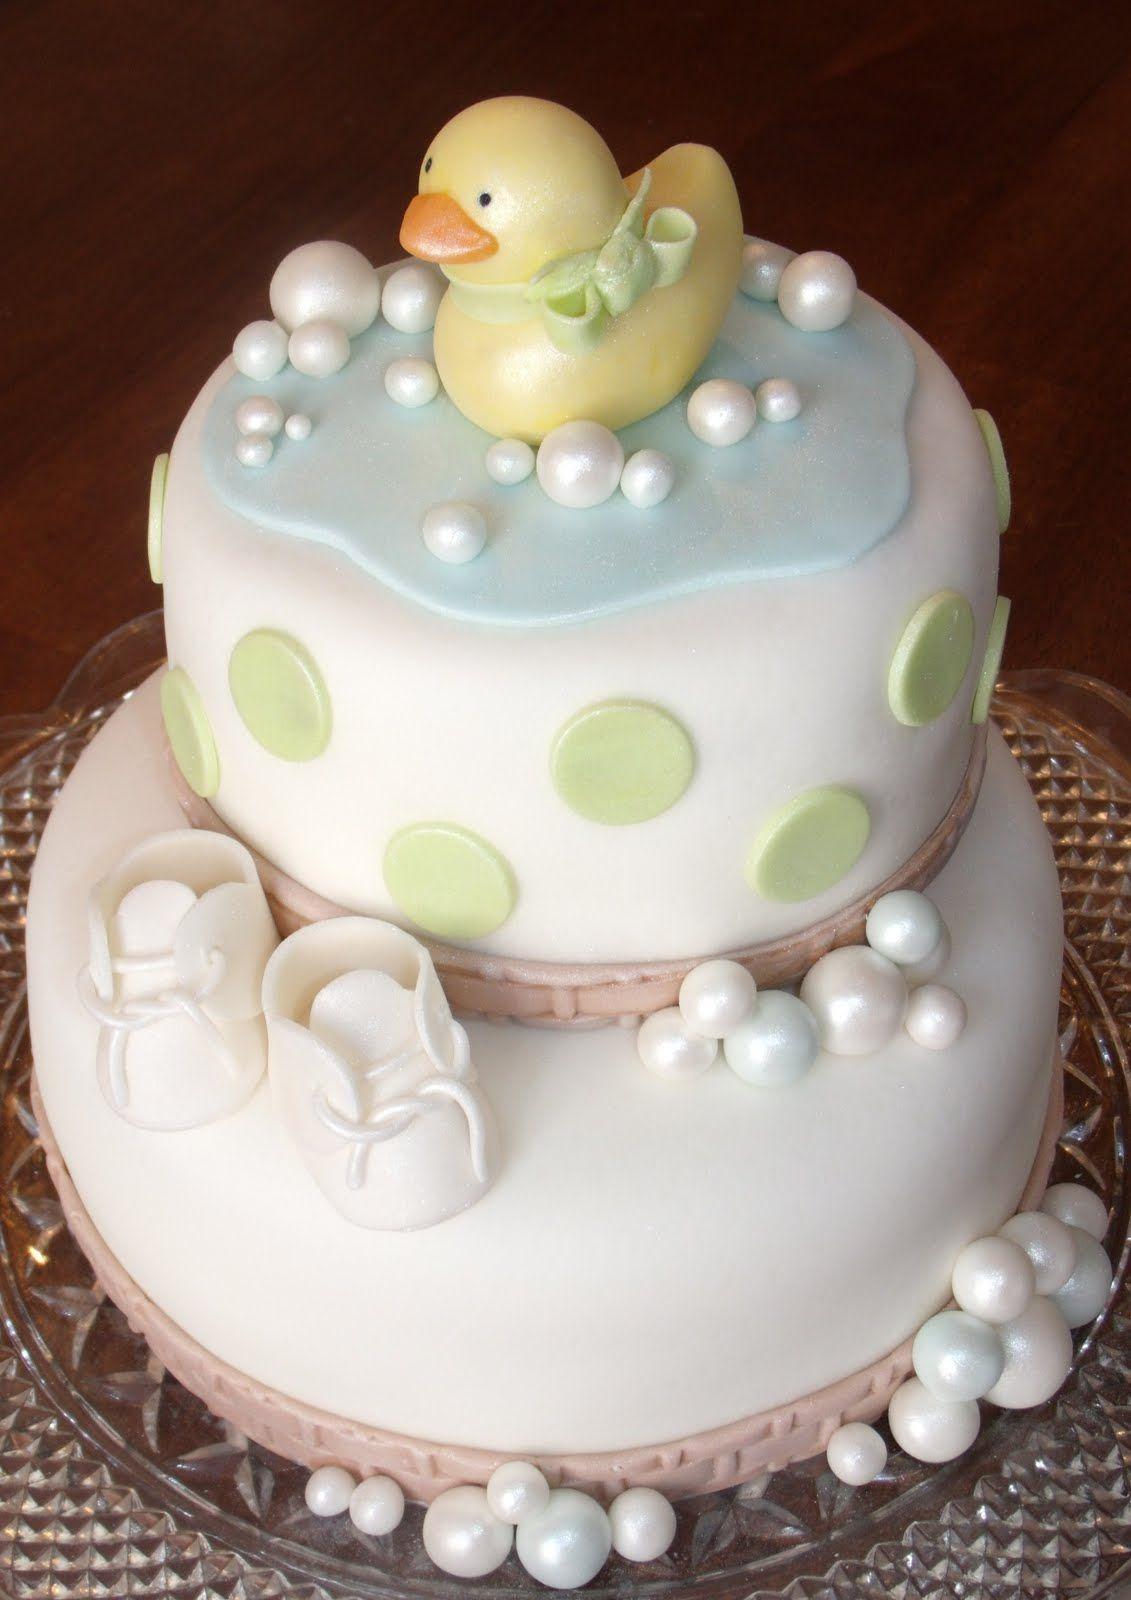 Ducky, Baby Shower Cake